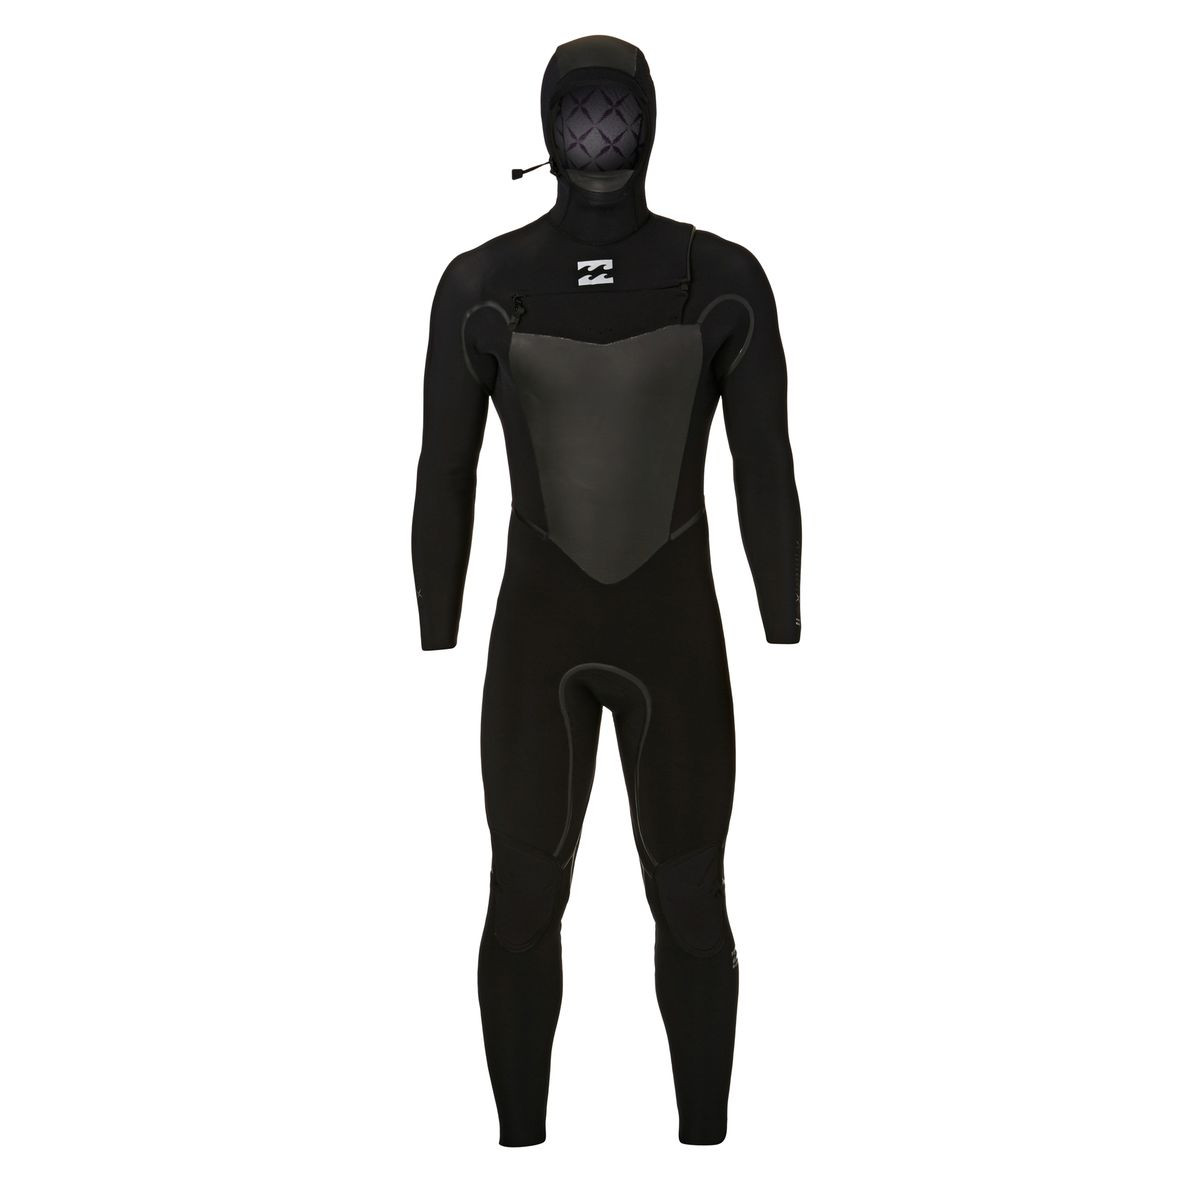 Billabong Furnace Carbon X 7/6mm 2018 Hooded Chest Zip Wetsuit - Black